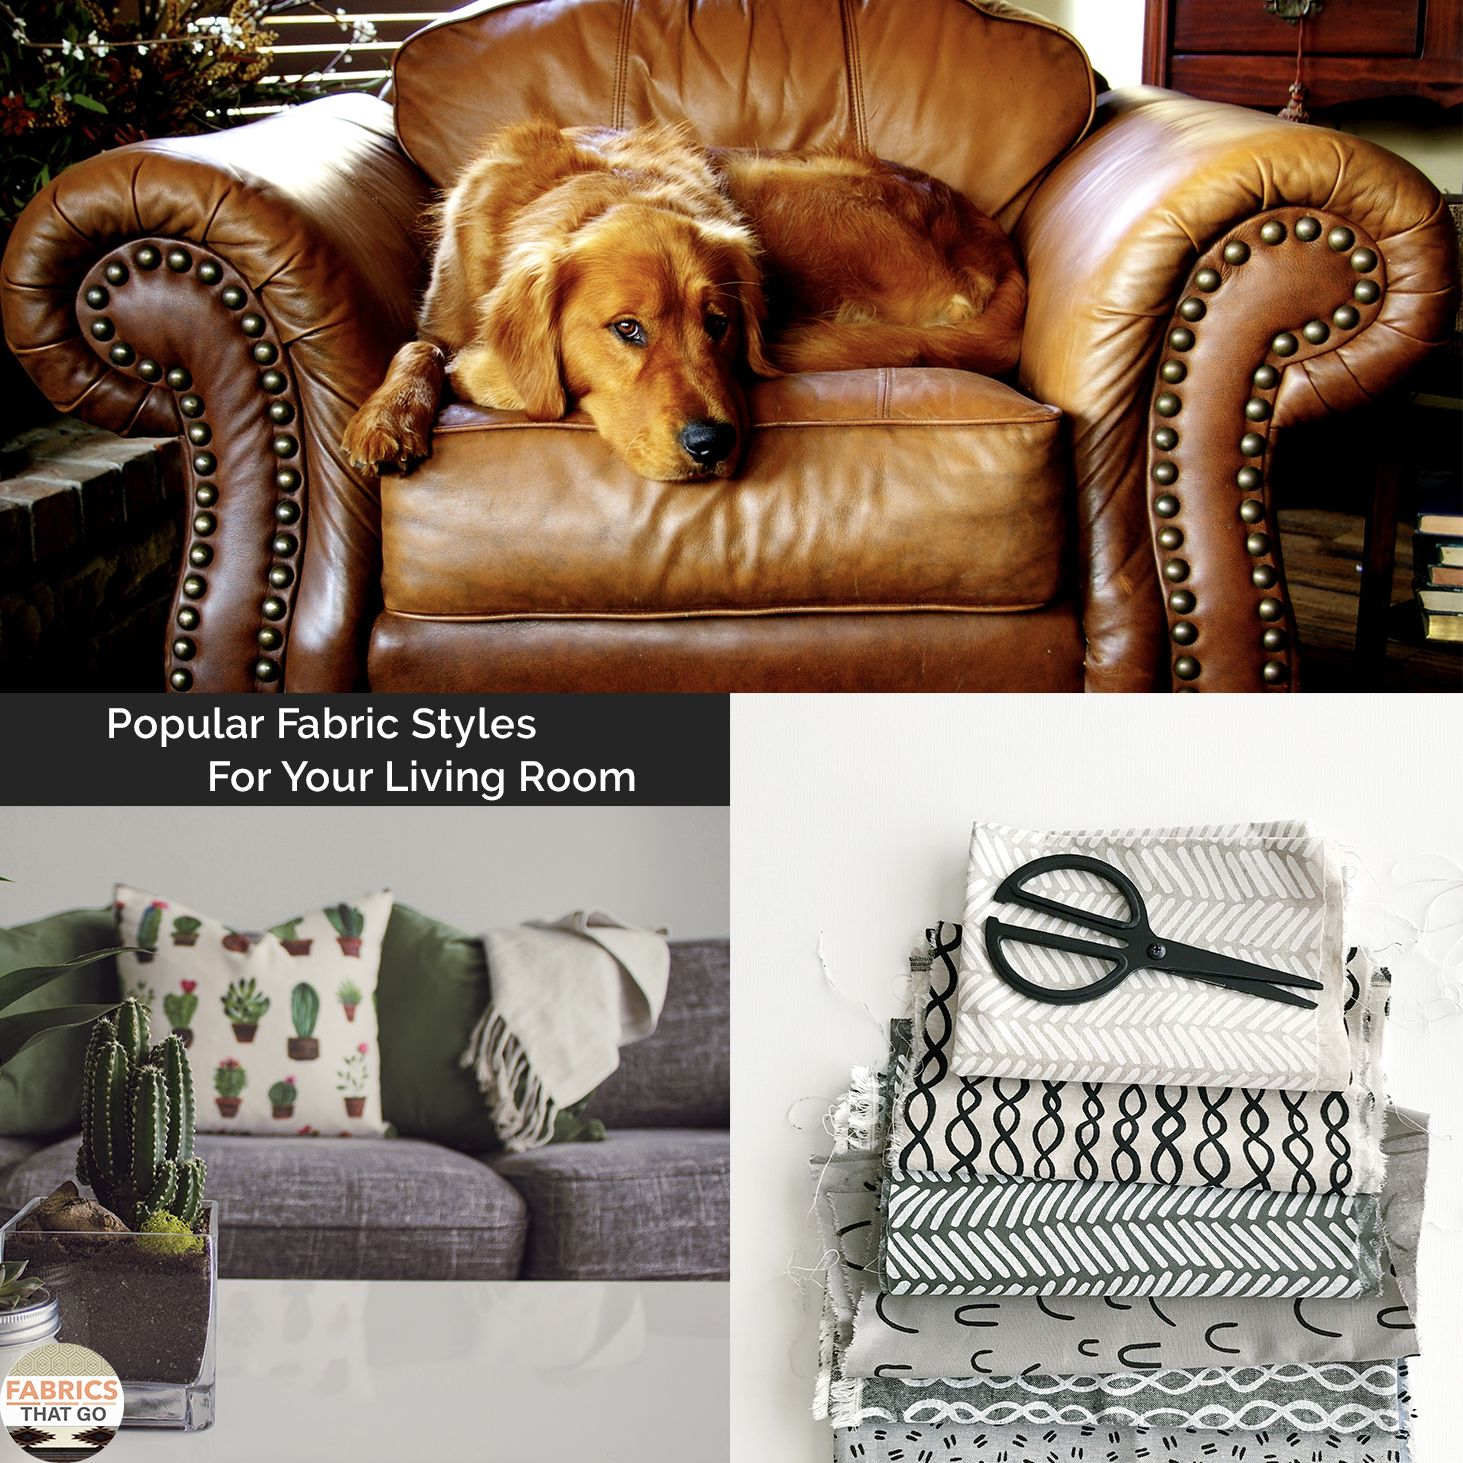 Fabric Styles For Living Area Tucson Az Drapery Upholstery